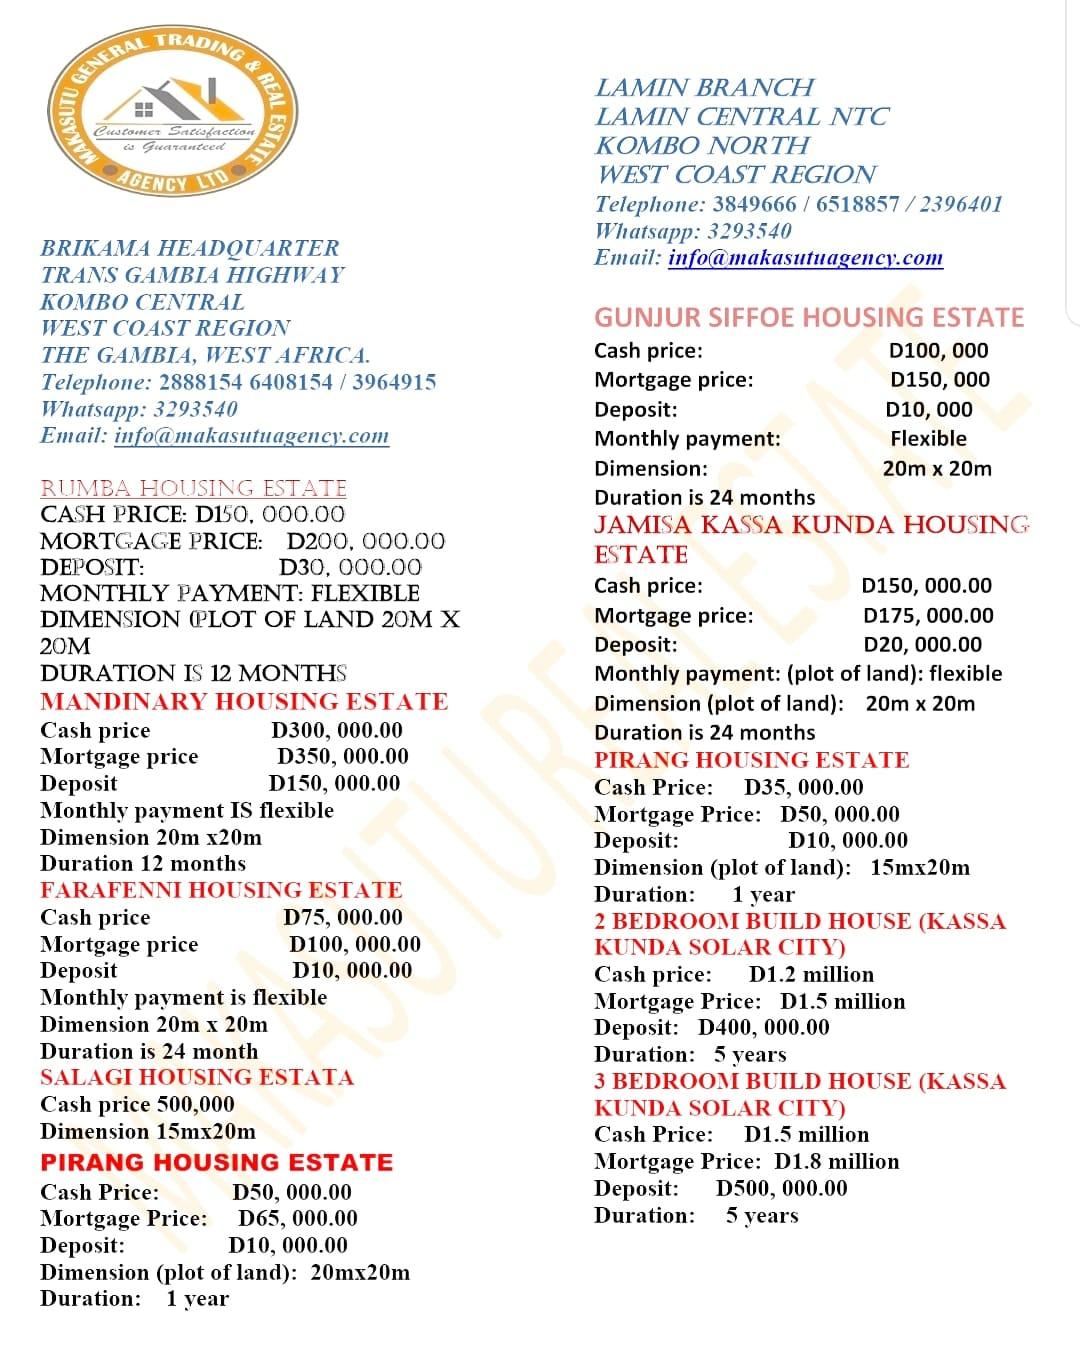 Makasutu Trading and Real Estate Agency